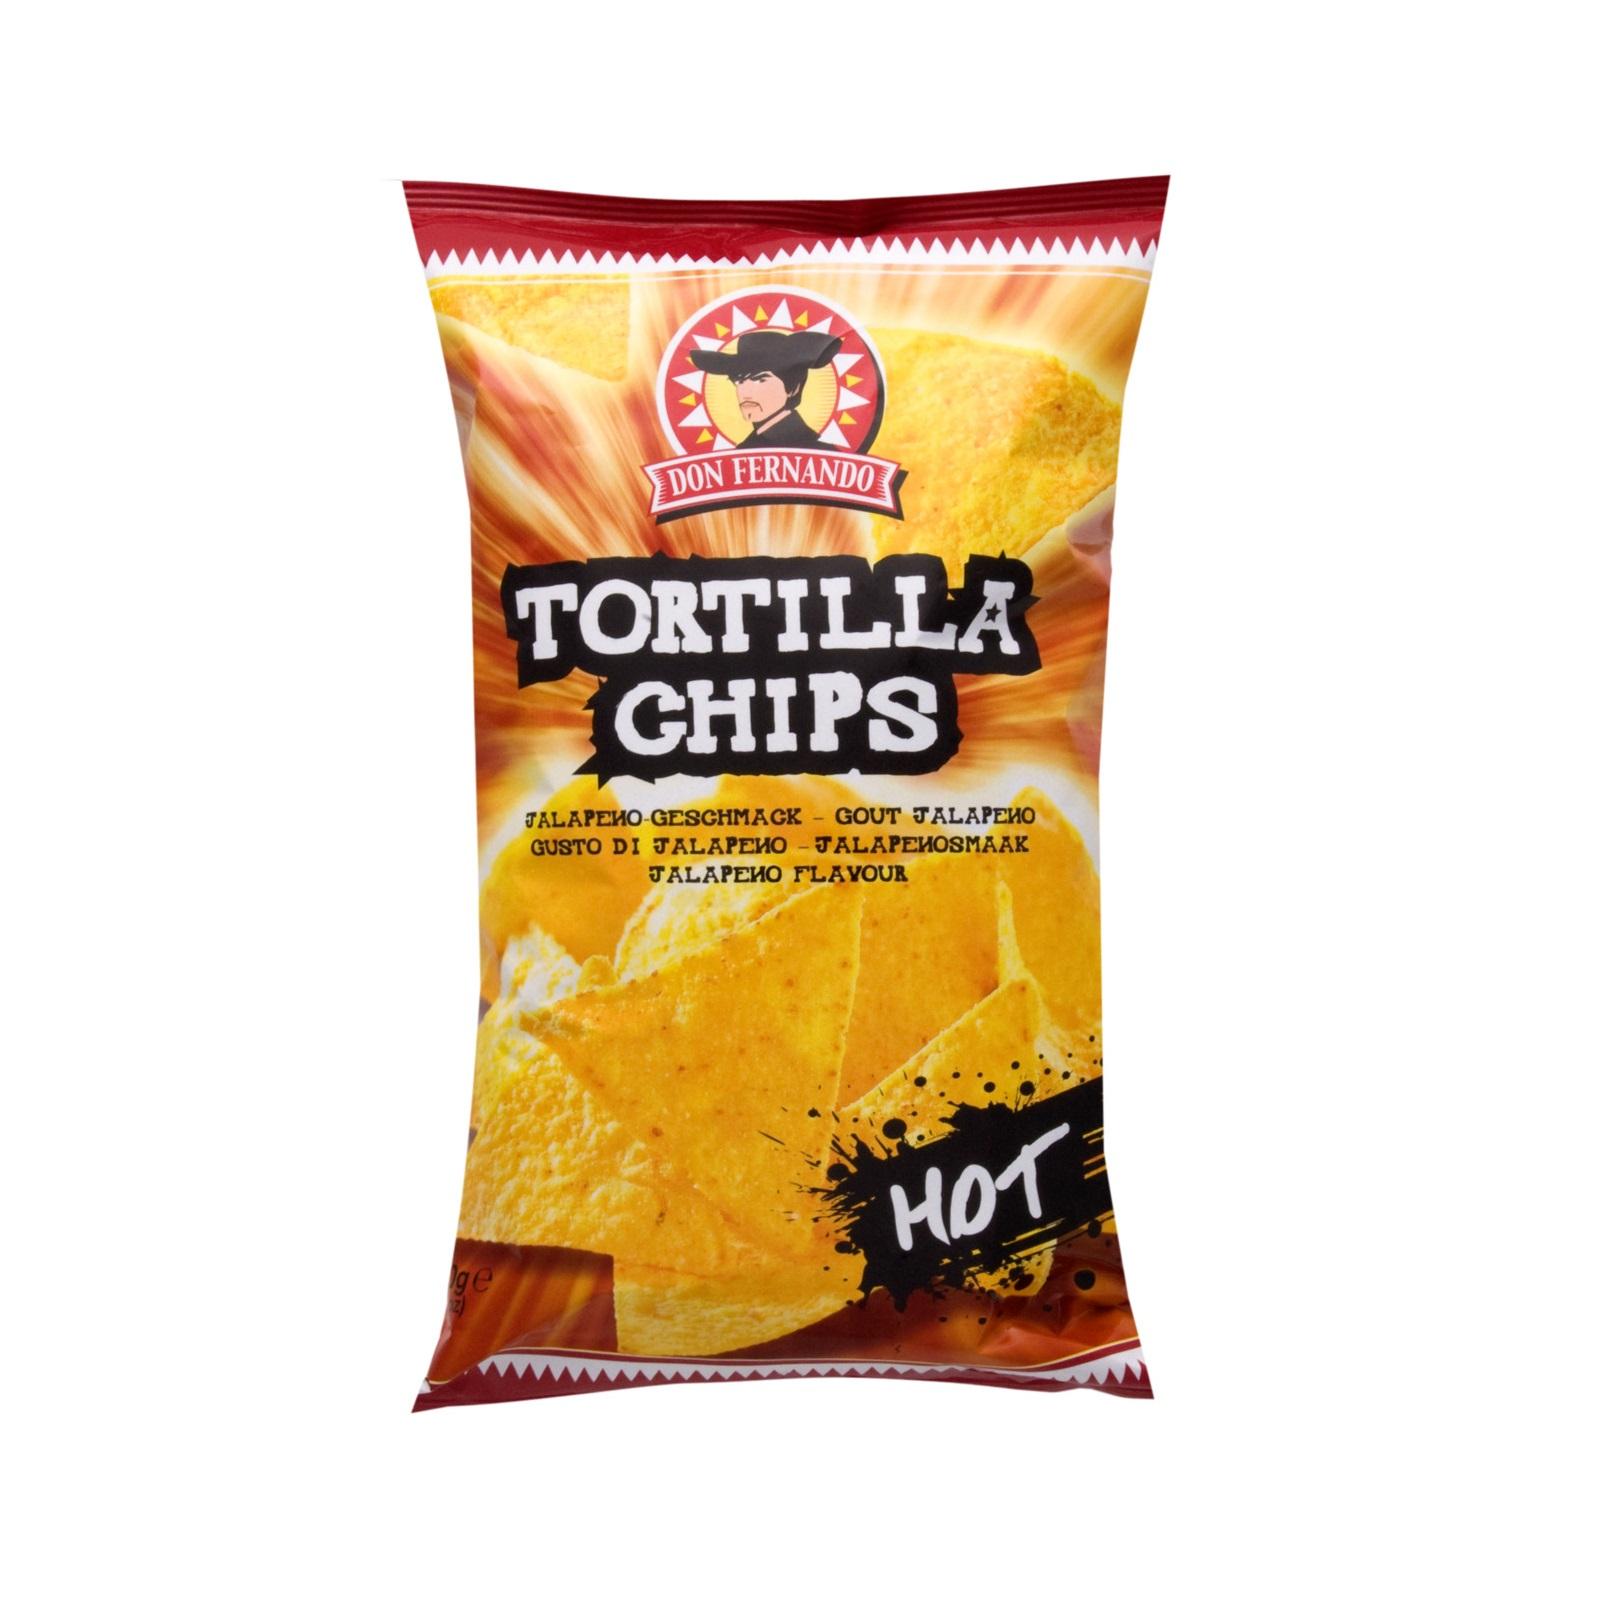 Don Fernando Tortilla Chips Hot Chili 200g